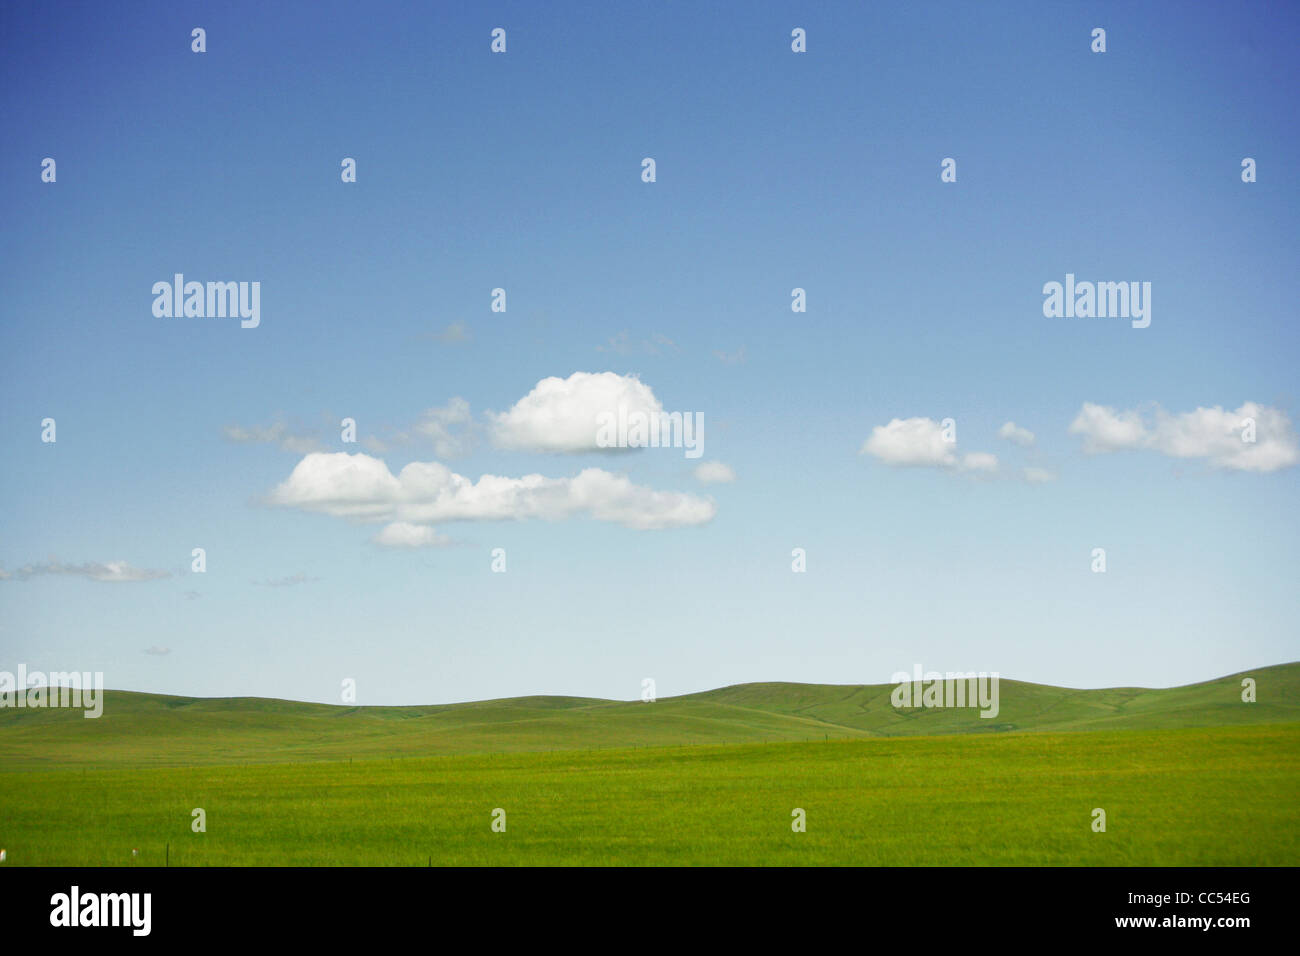 Paesaggio di Jinzhanghan tribe mongolo, Hulun Buir prateria, Manzhouli, Hulunbuir, Mongolia Interna Regione Autonoma, Immagini Stock